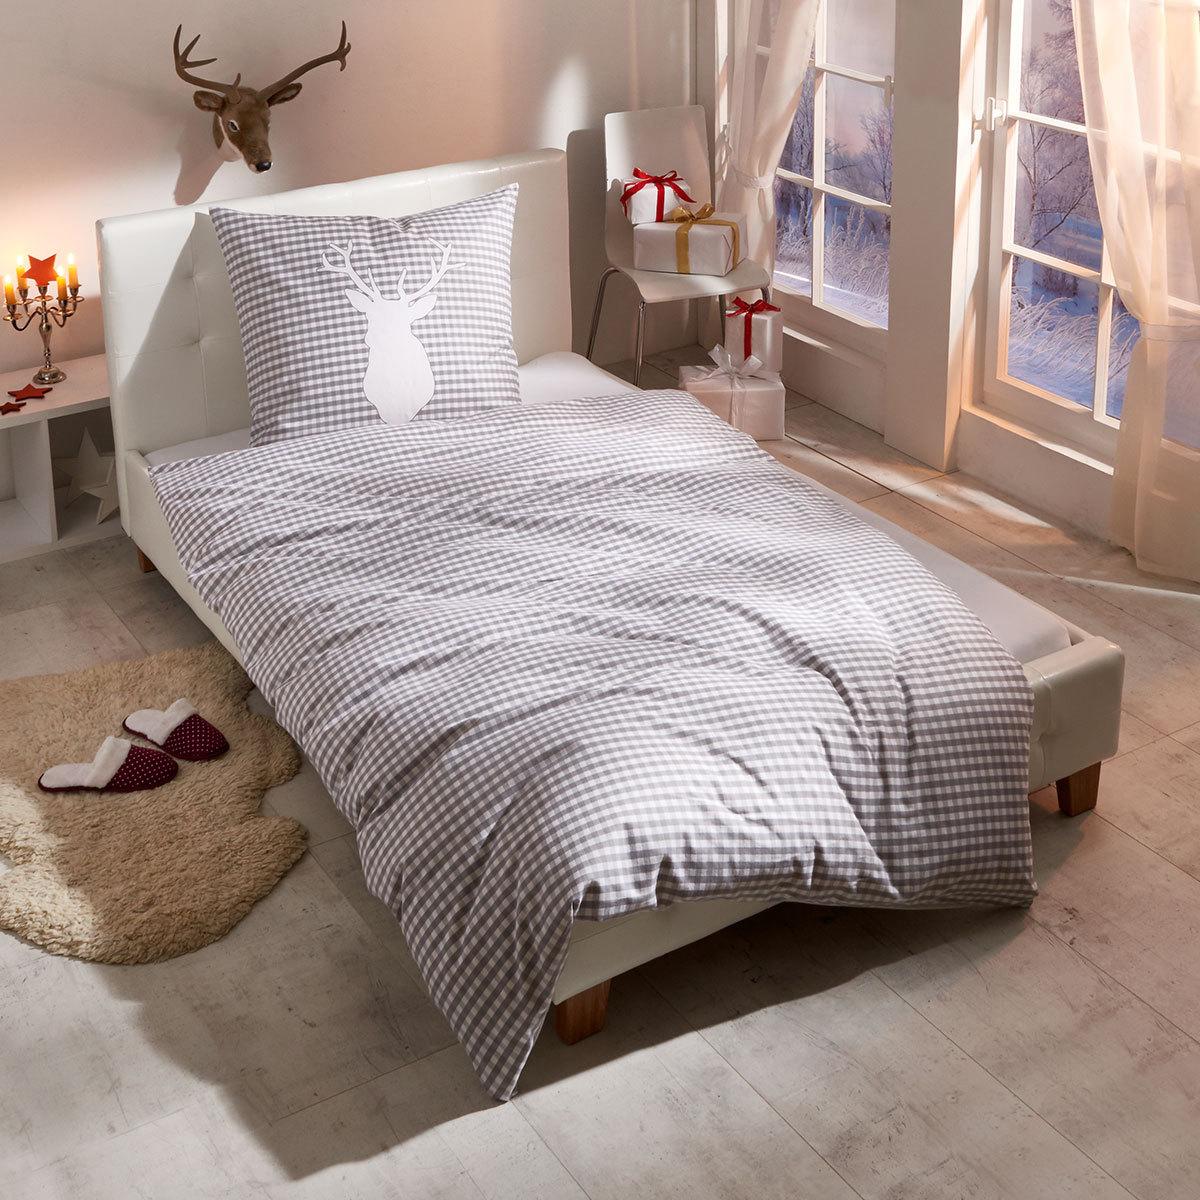 bettwarenshop biber wendebettw sche hirsch g nstig online kaufen bei bettwaren shop. Black Bedroom Furniture Sets. Home Design Ideas